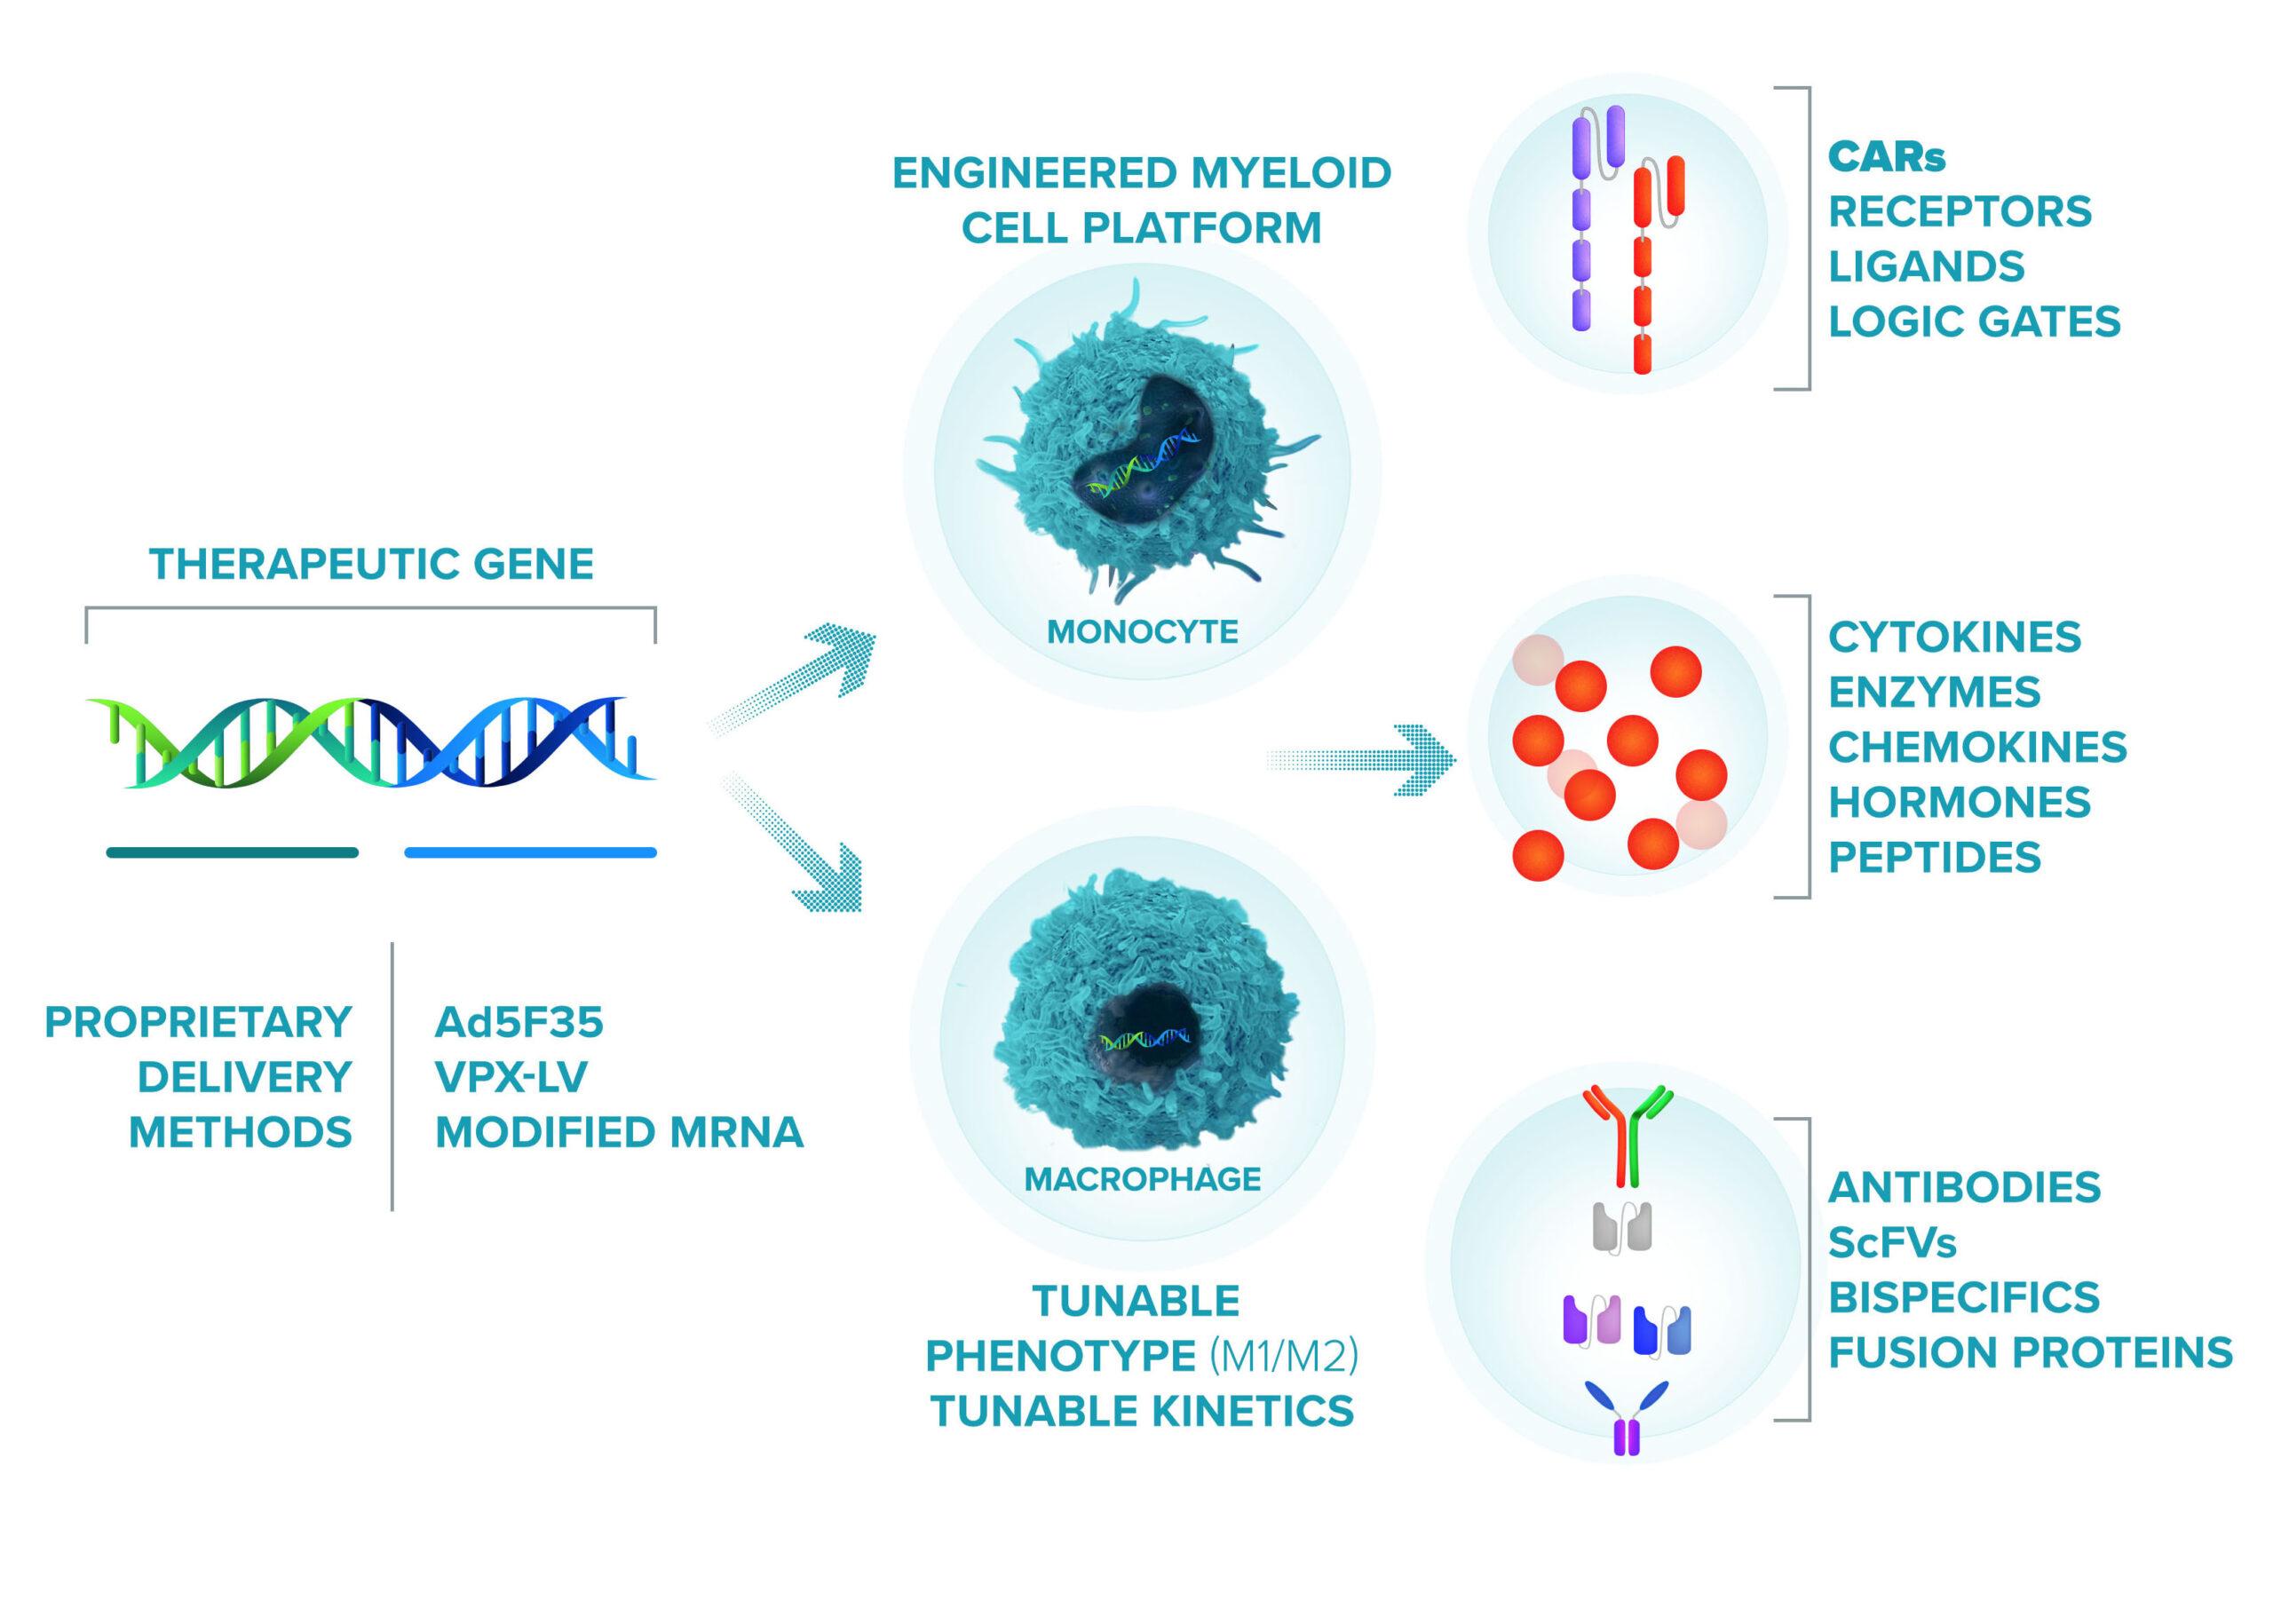 carisma-engineered-cell-platform